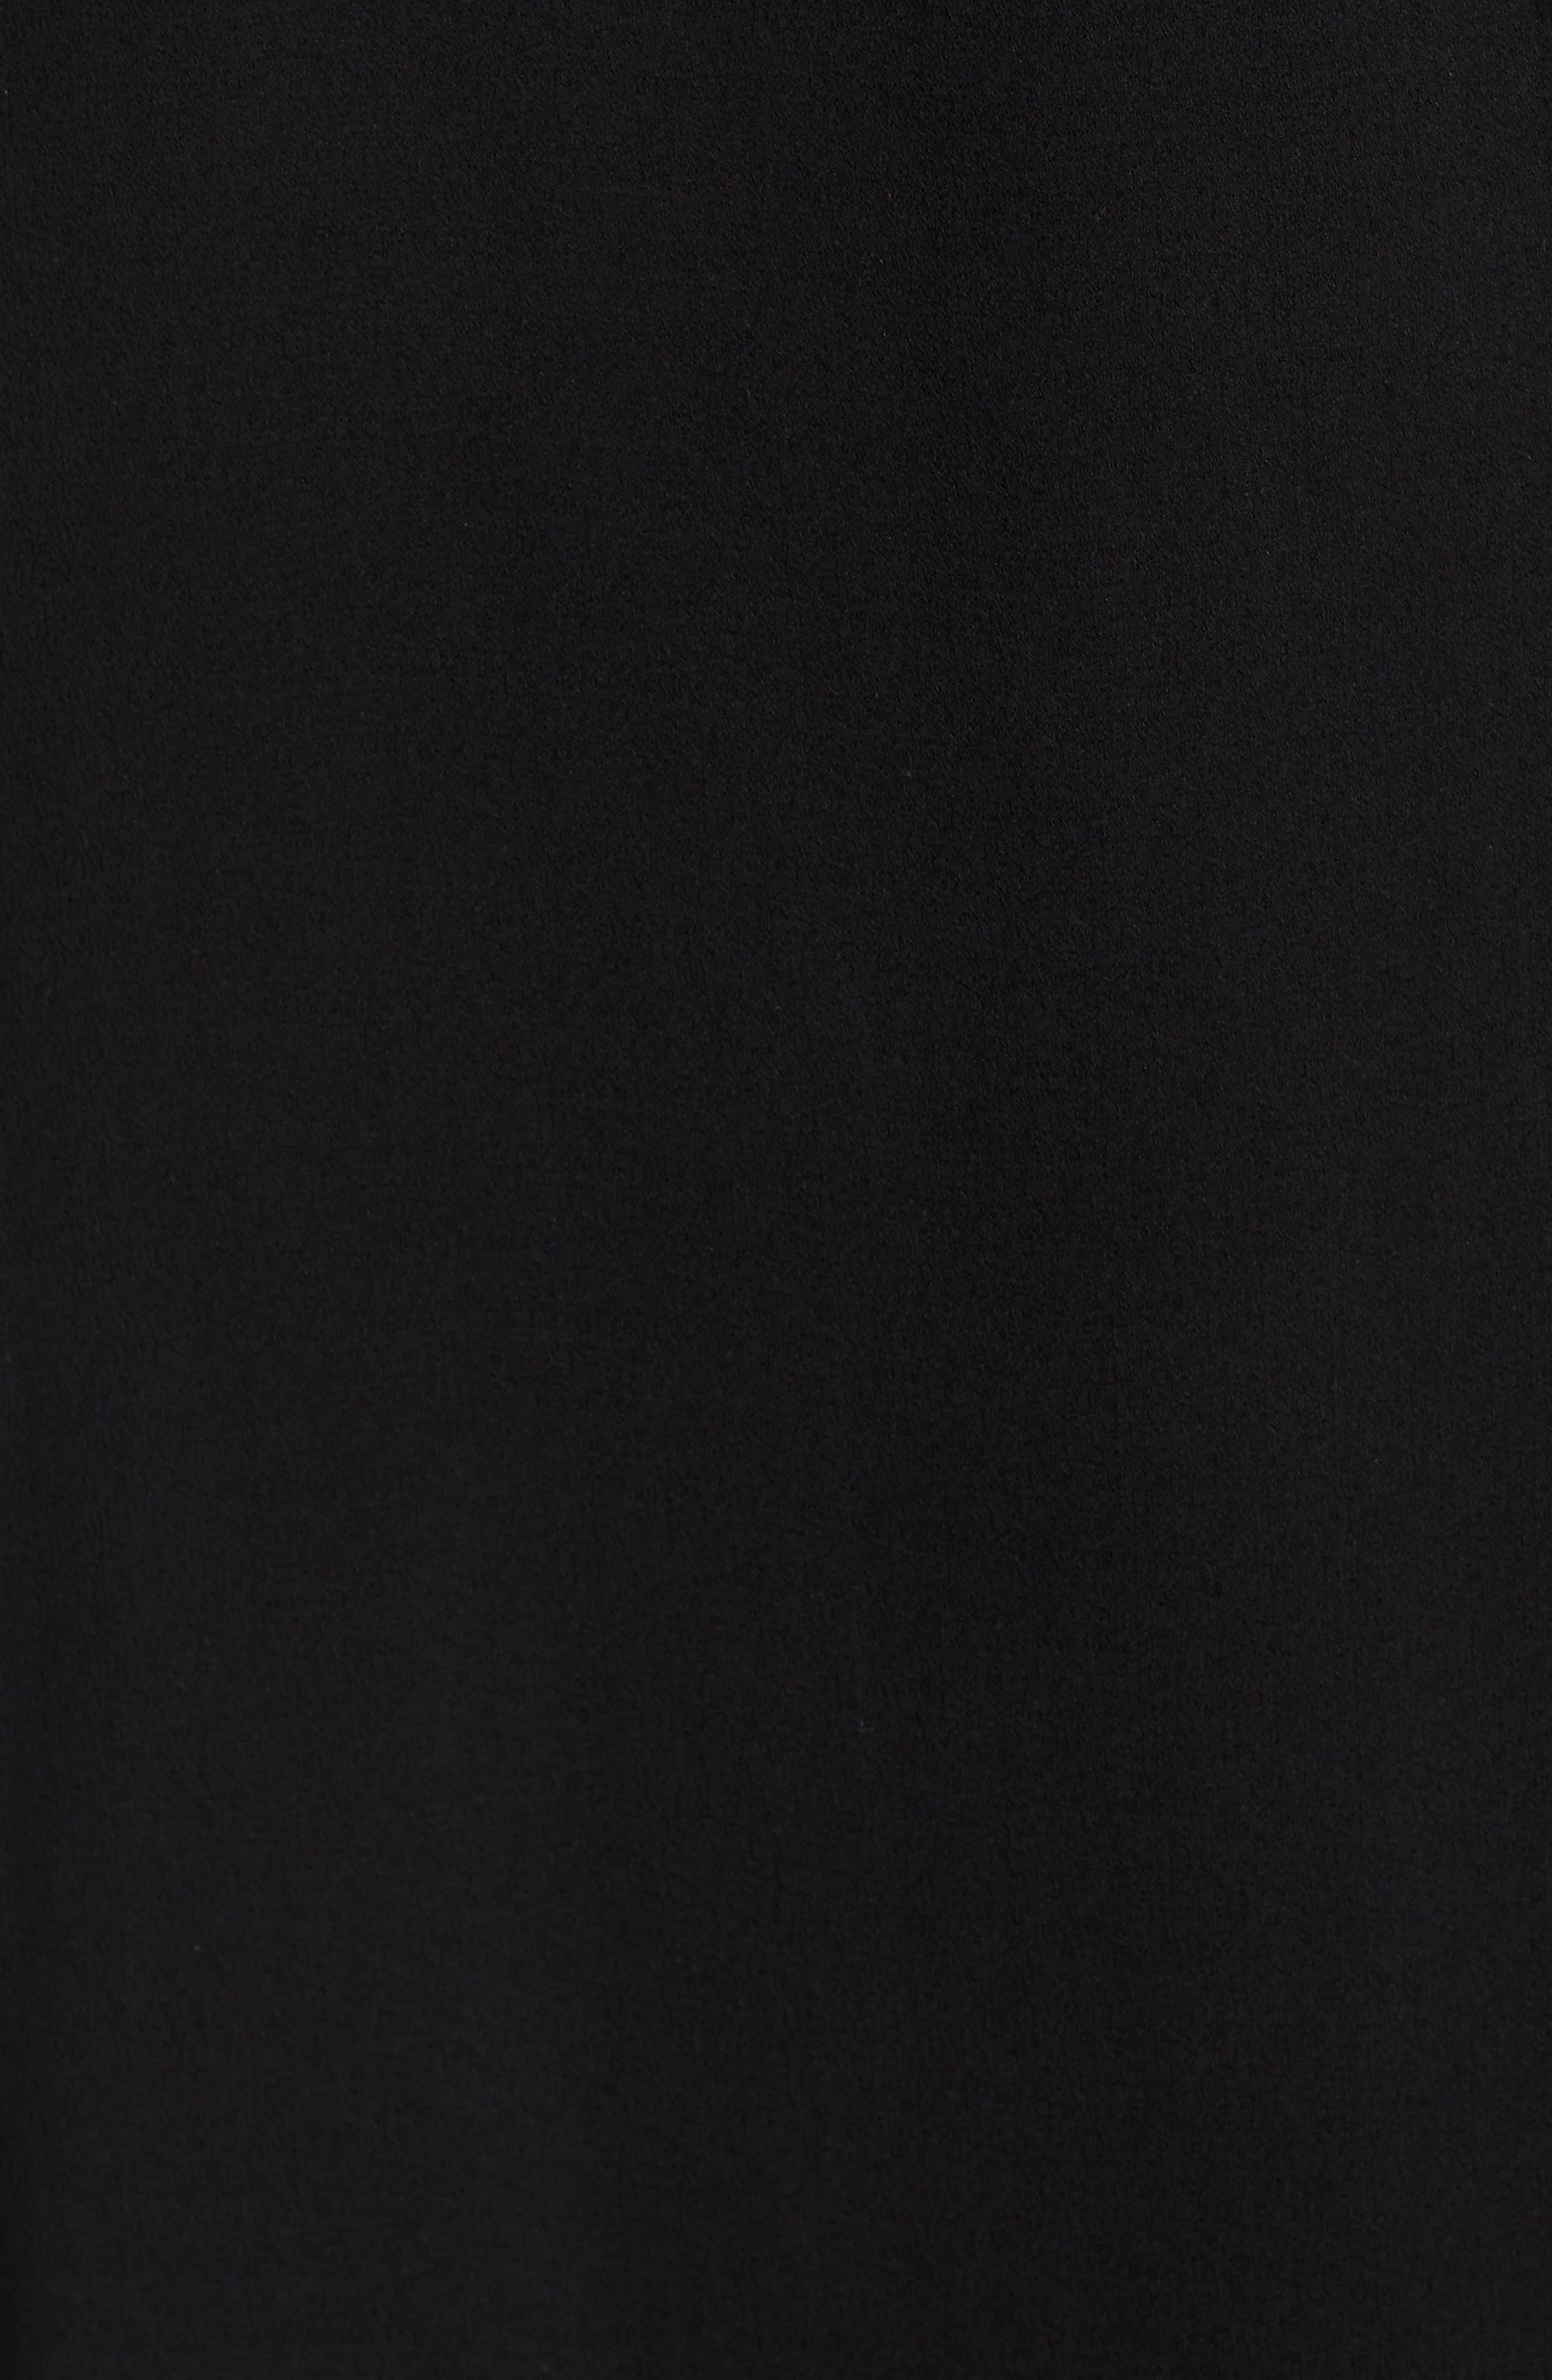 Silk Wrap Dress,                             Alternate thumbnail 6, color,                             Black